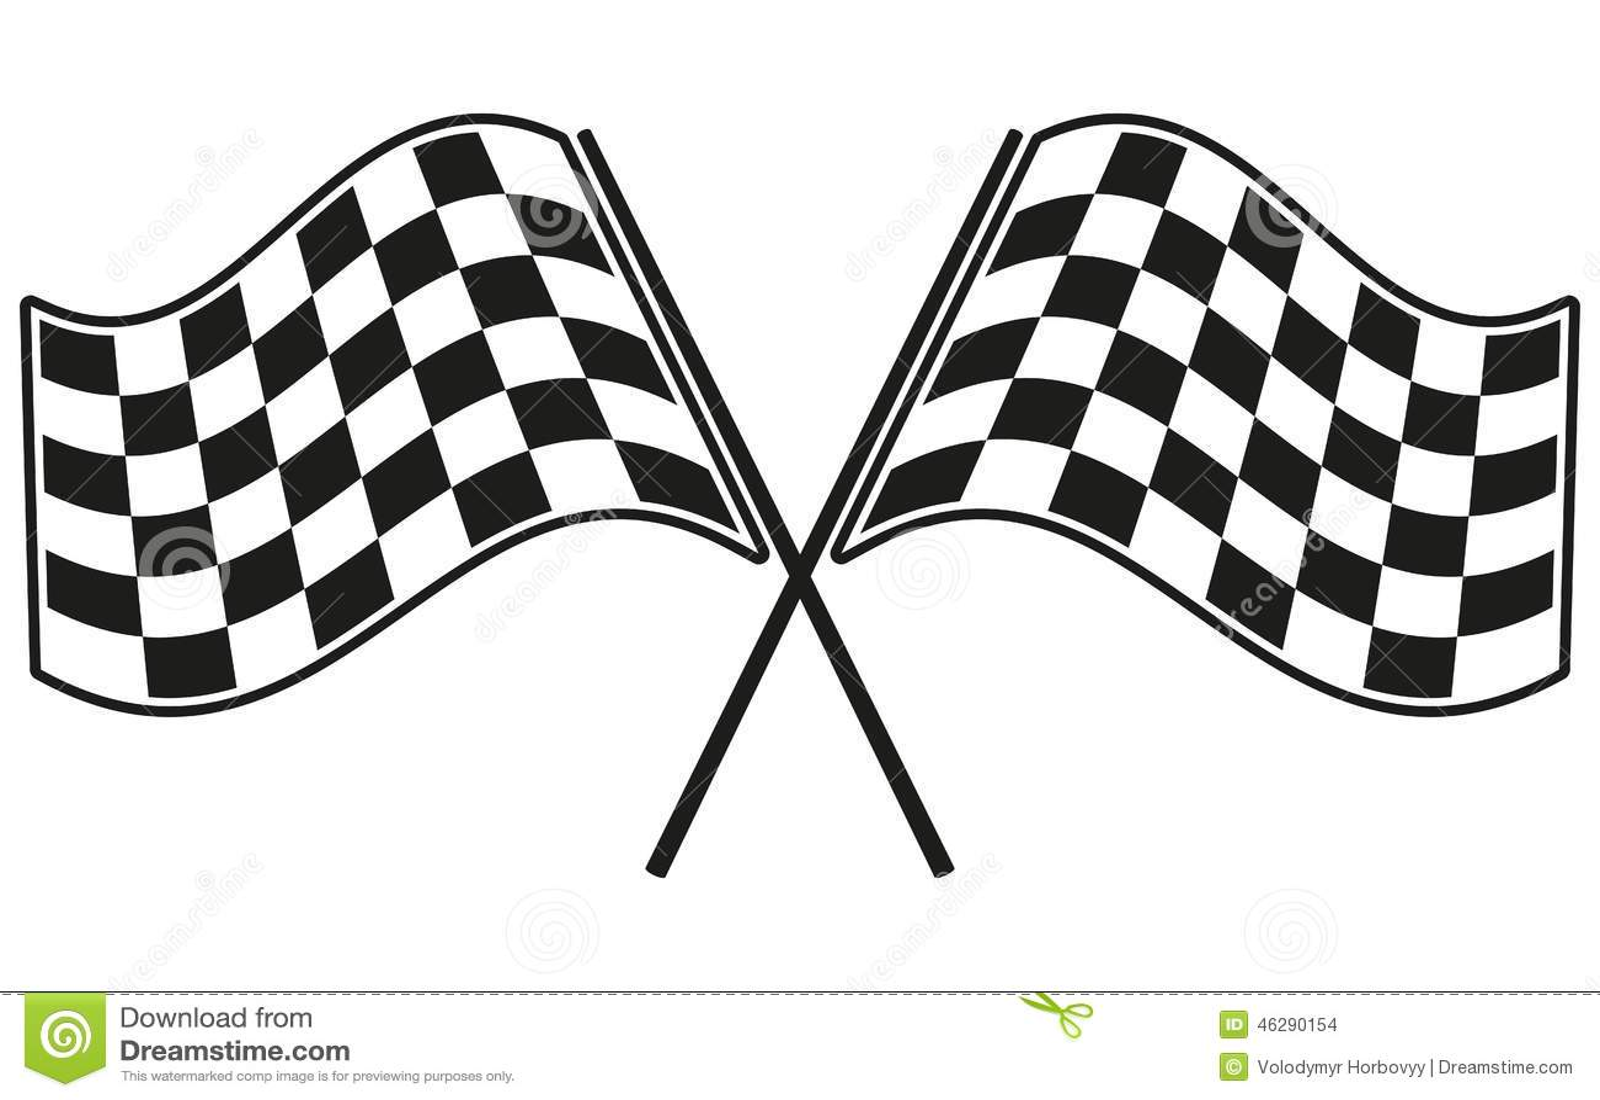 racing the clock clip art video - photo #39